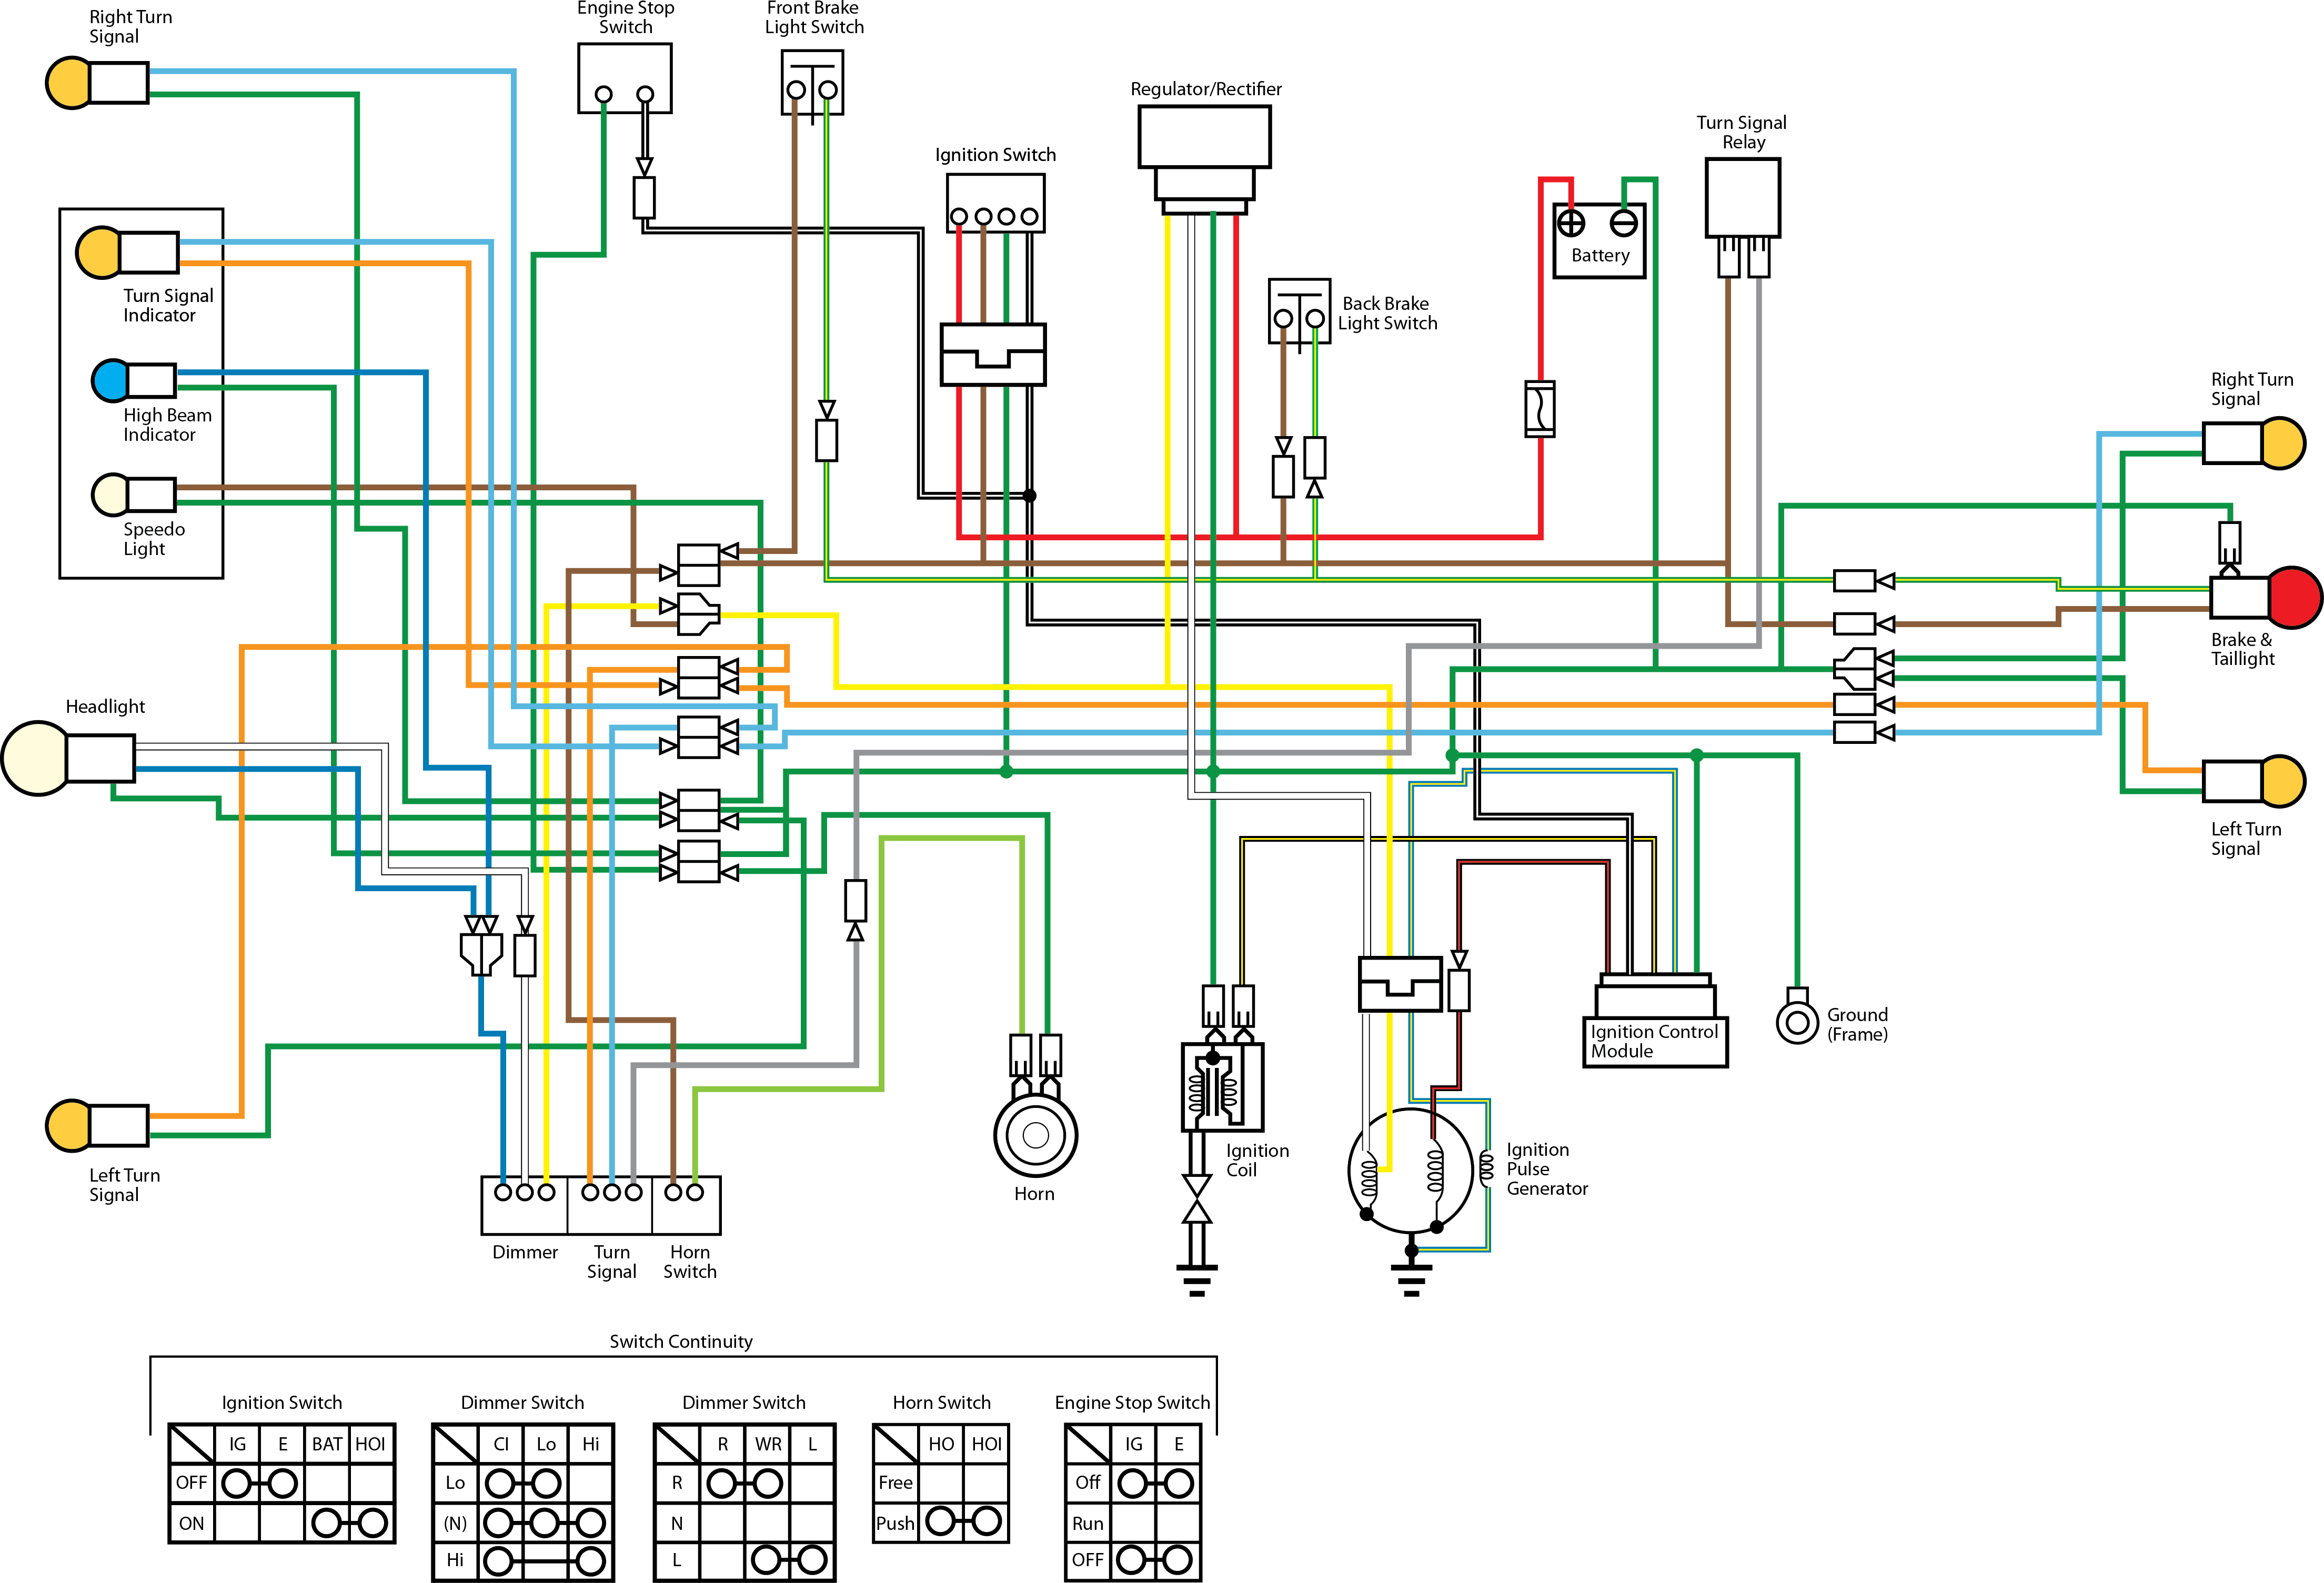 honda element radio wiring diagram image 2003 honda accord ex radio wiring diagram wiring diagram and hernes on 2003 honda element radio